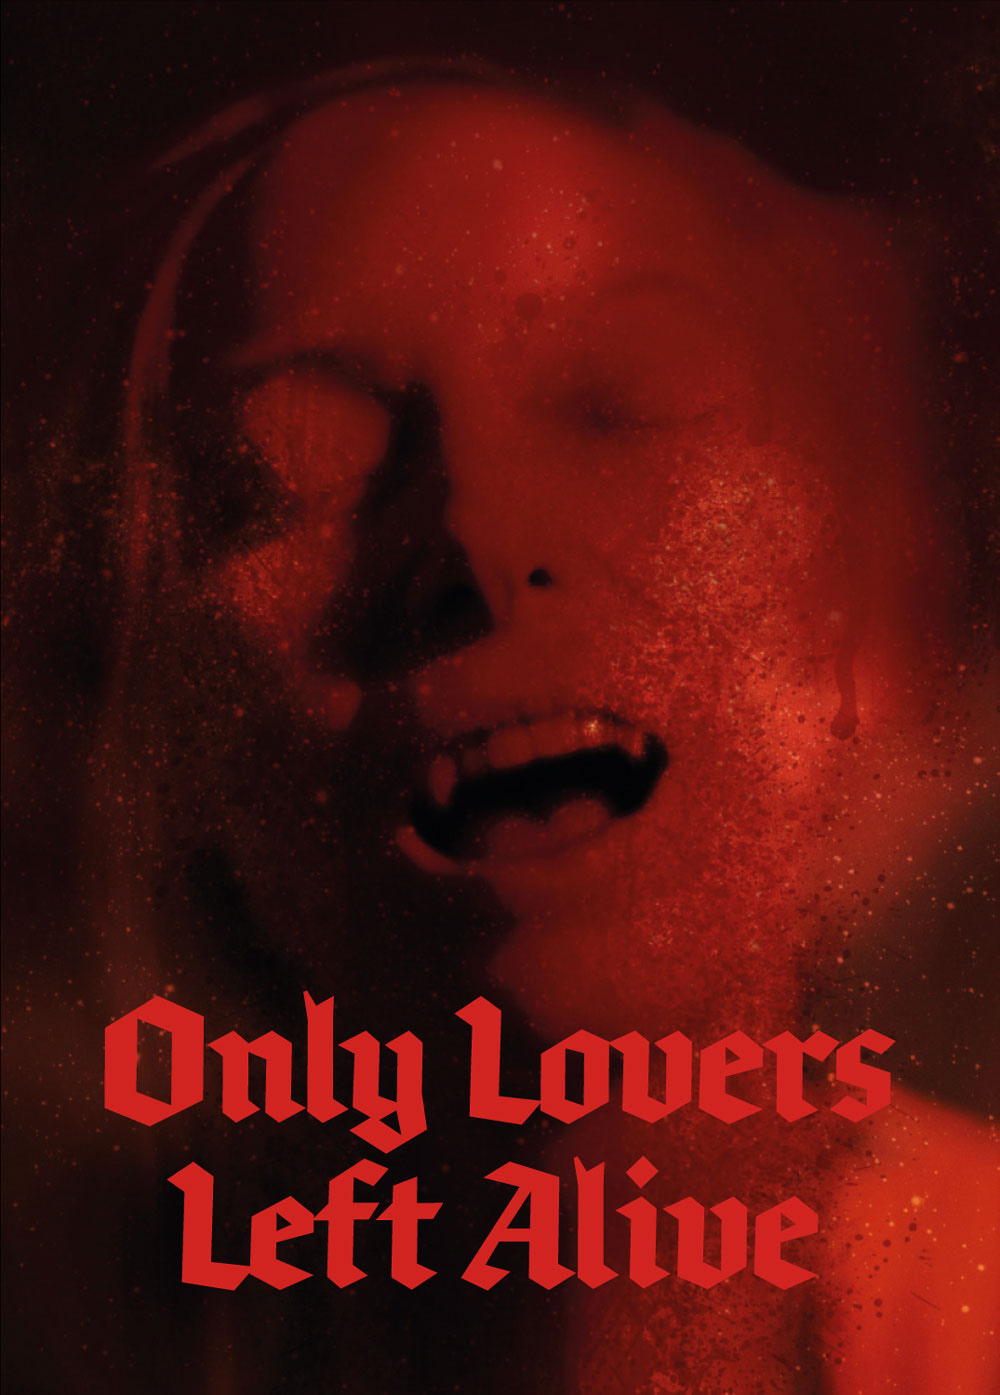 Adobe Portfolio music Film   Jim Jarmusch Tilda Swinton tom hiddleston graphic design  gore Vampires atp